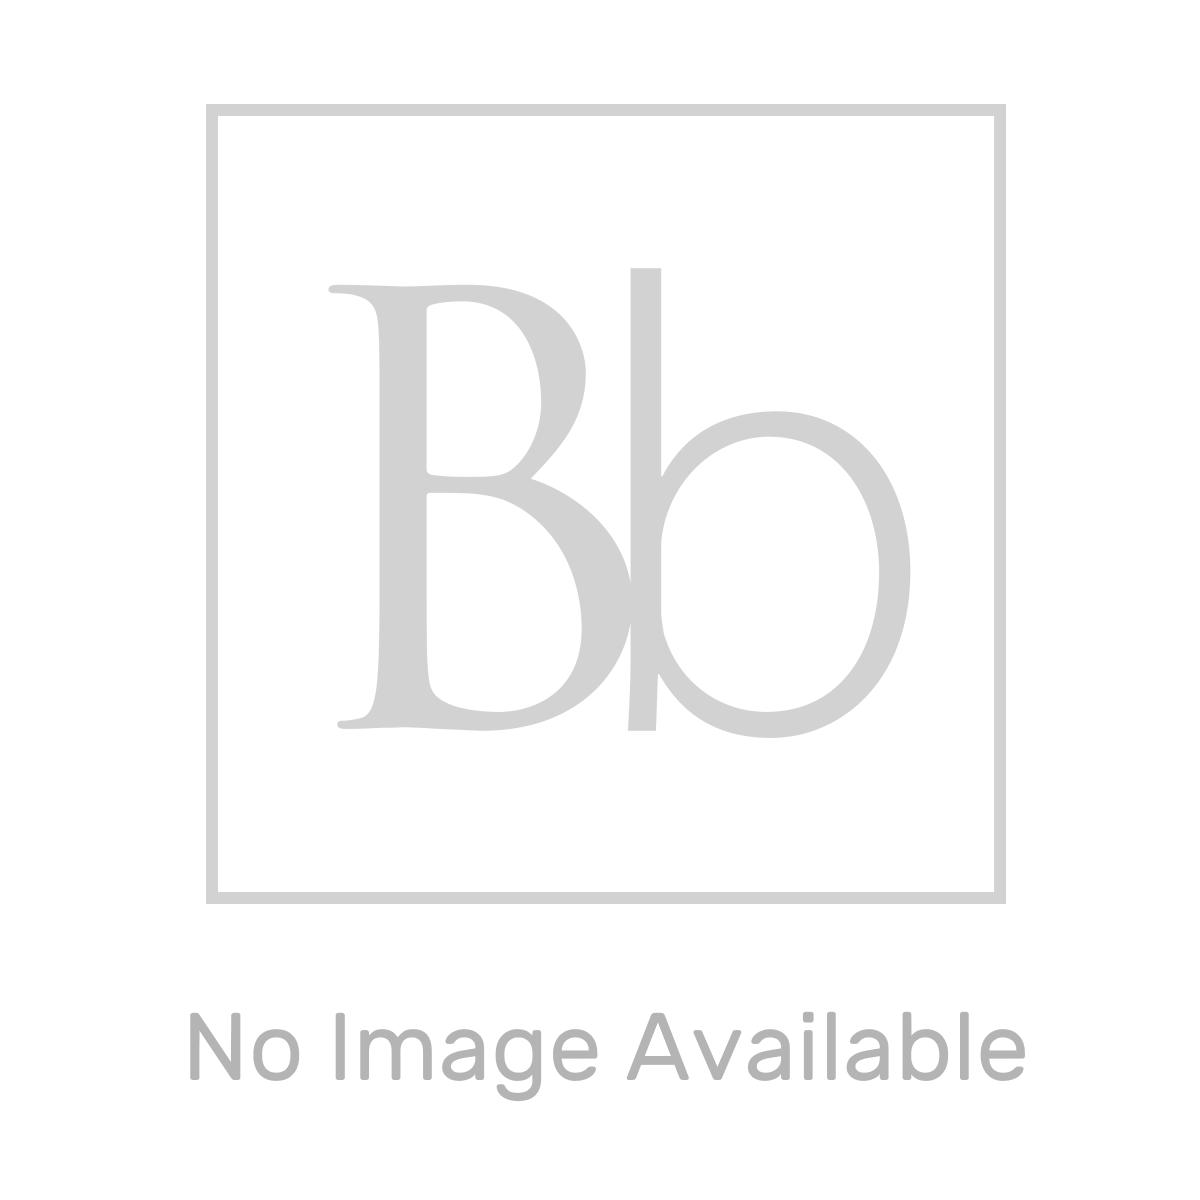 RAK Feeling Grey Square Single Outlet Thermostatic Shower Valve